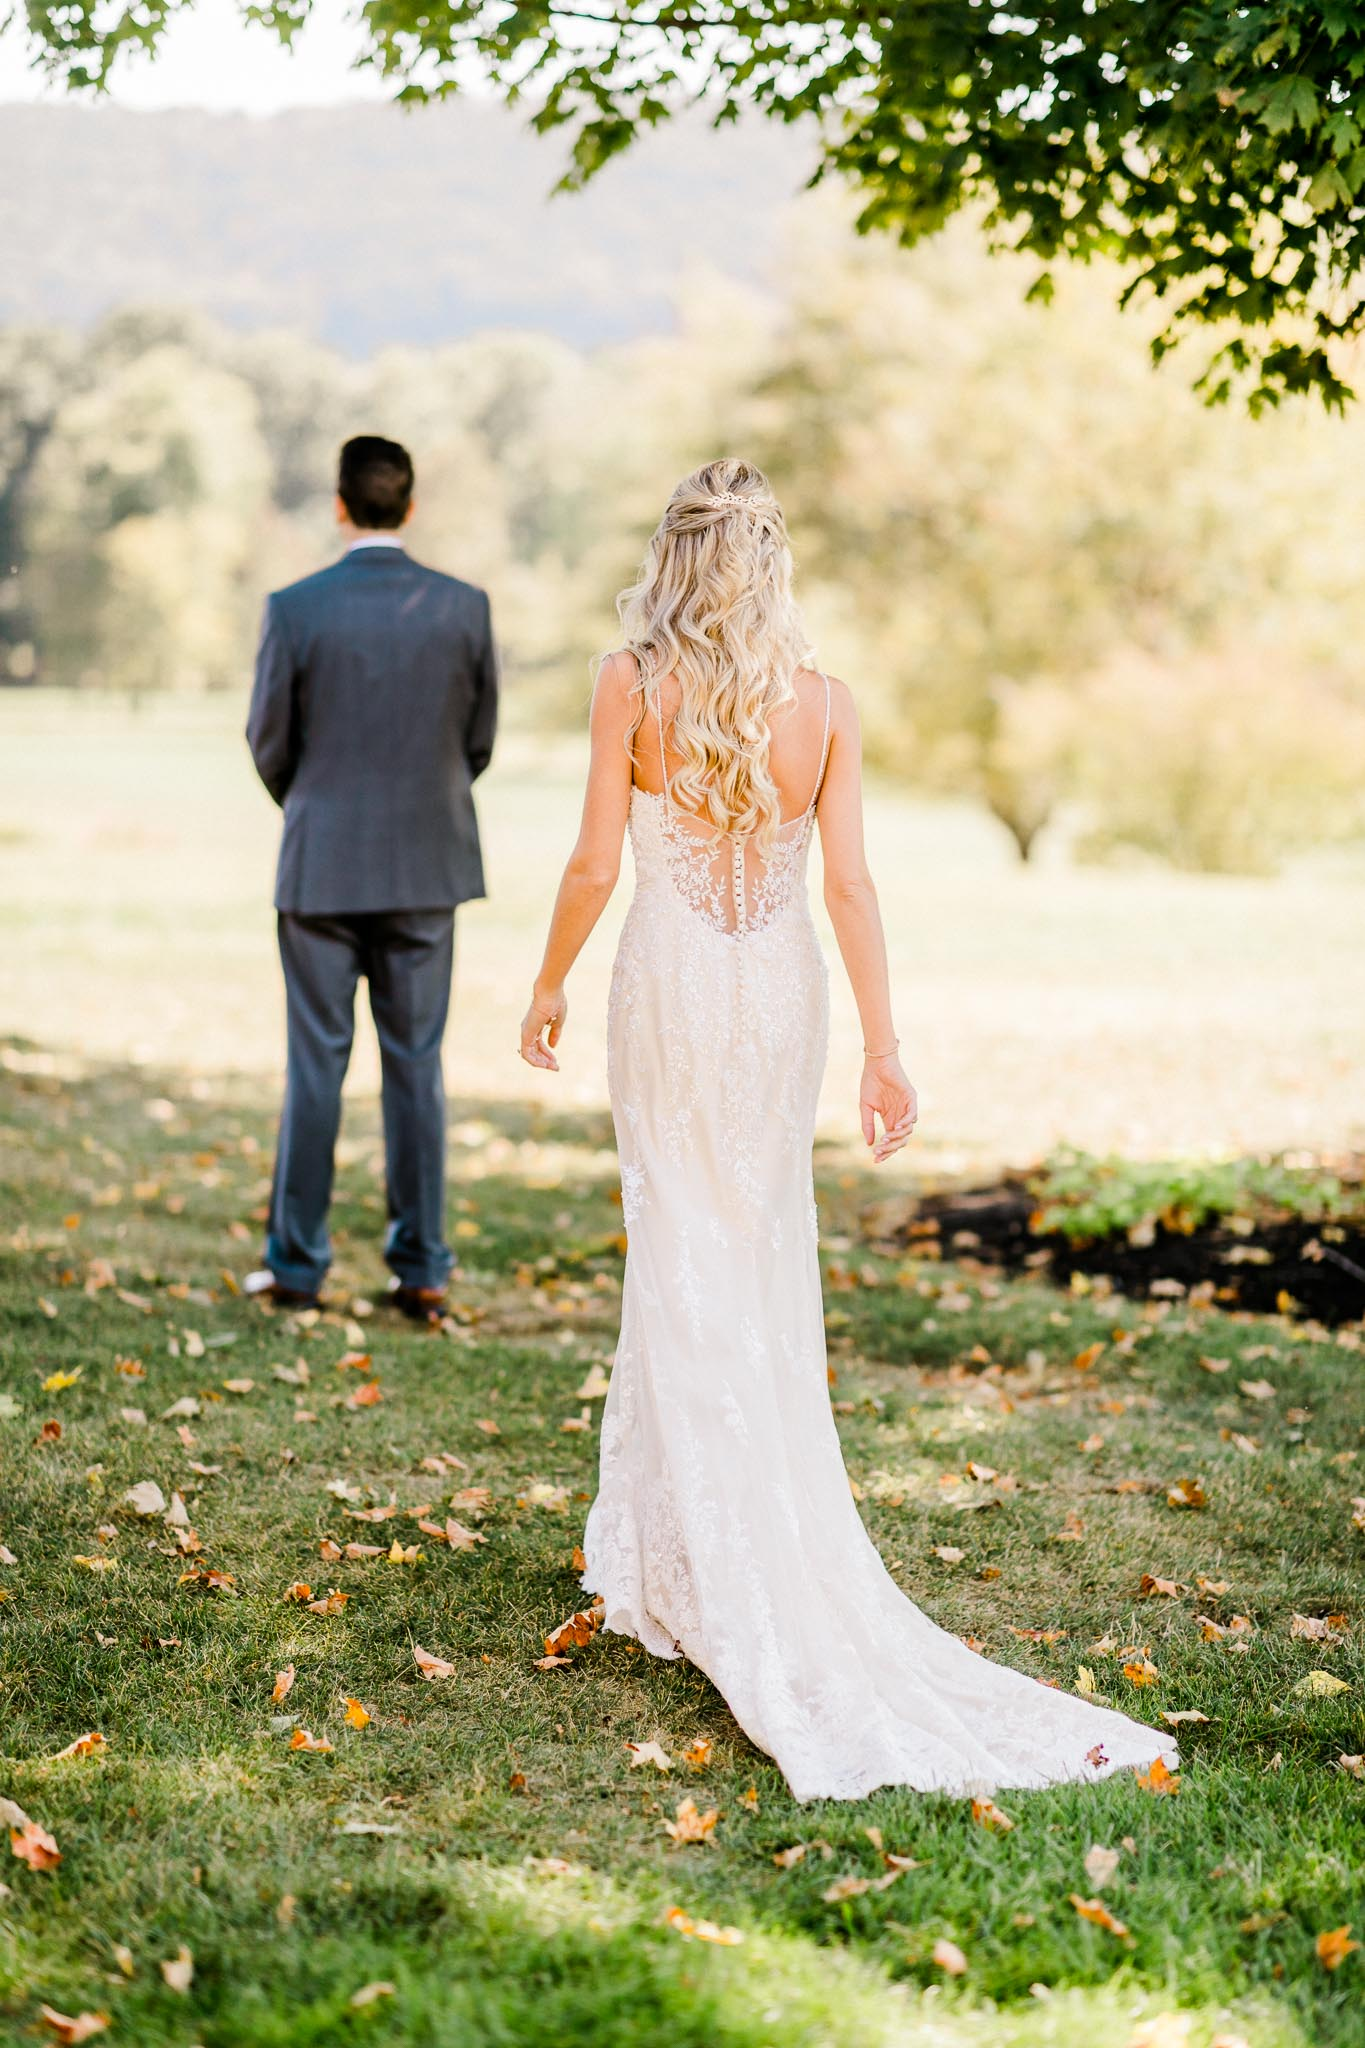 Frosty-Valley-September-Wedding-7158.jpg